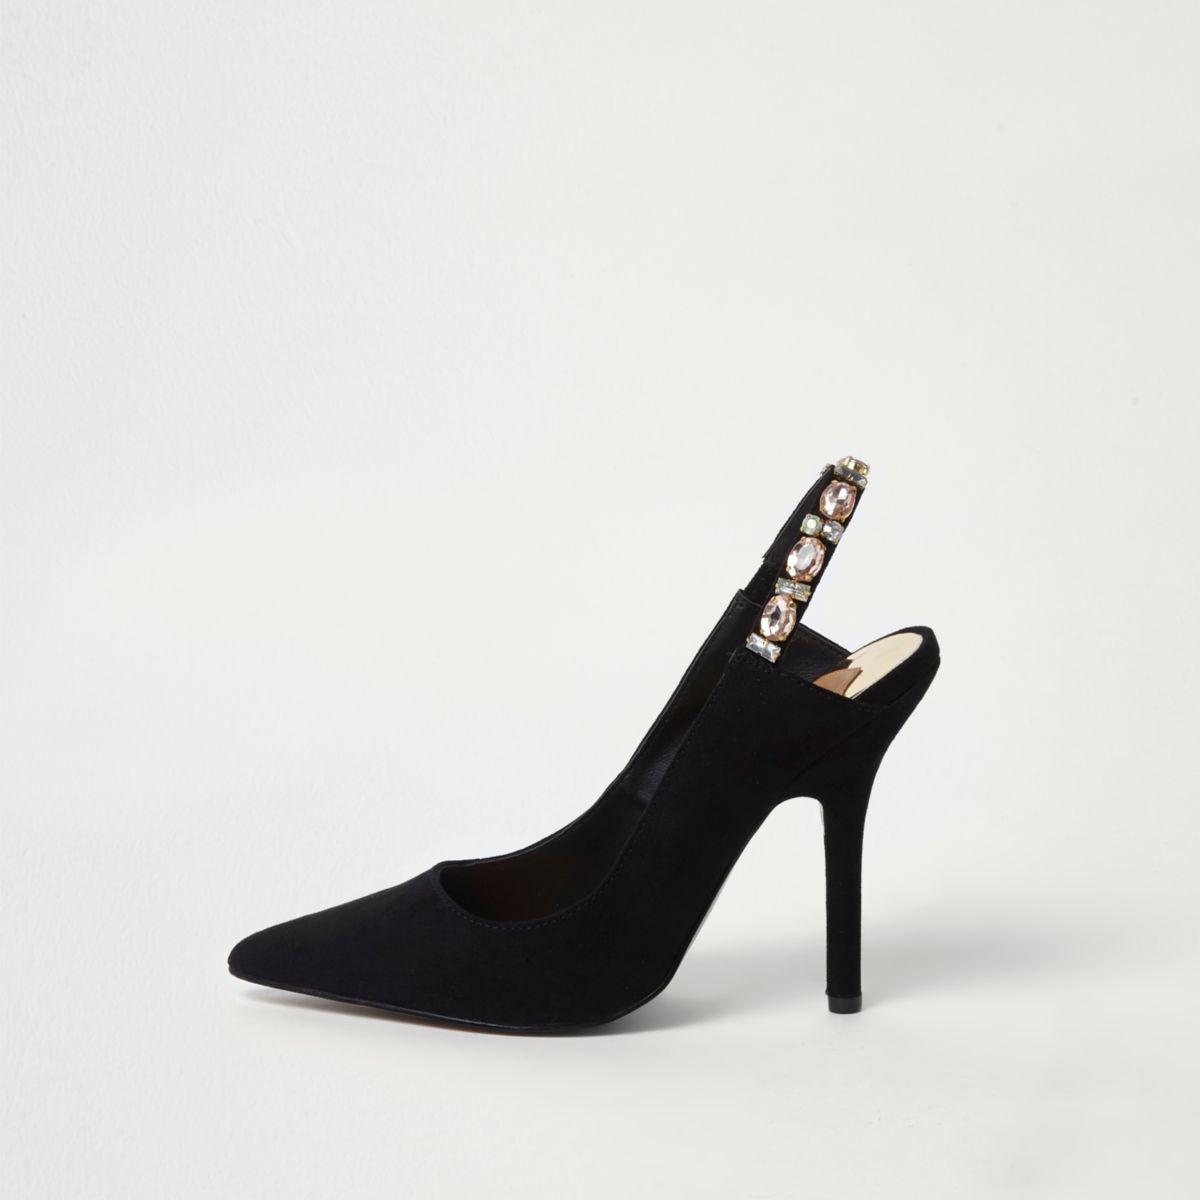 Black jewel slingback pumps